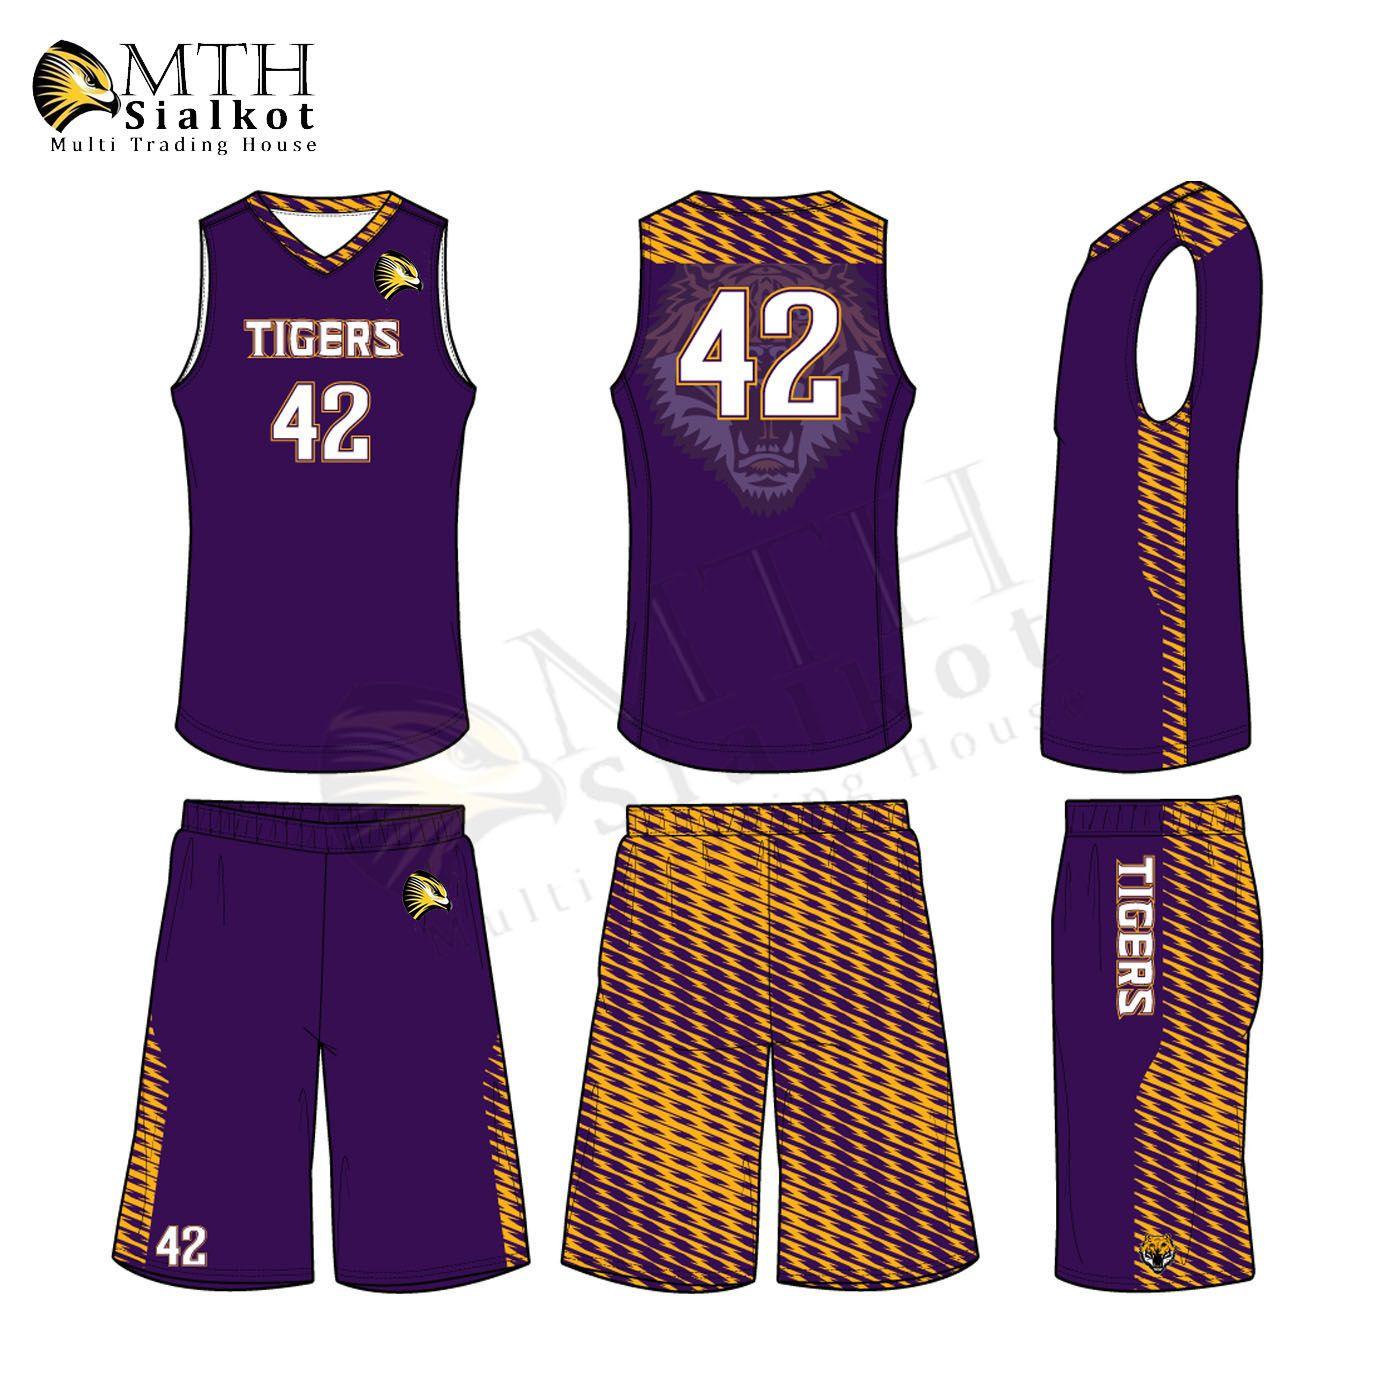 b3571044c447 Custom Sublimated Basketball Uniforms Order today basketball uniforms